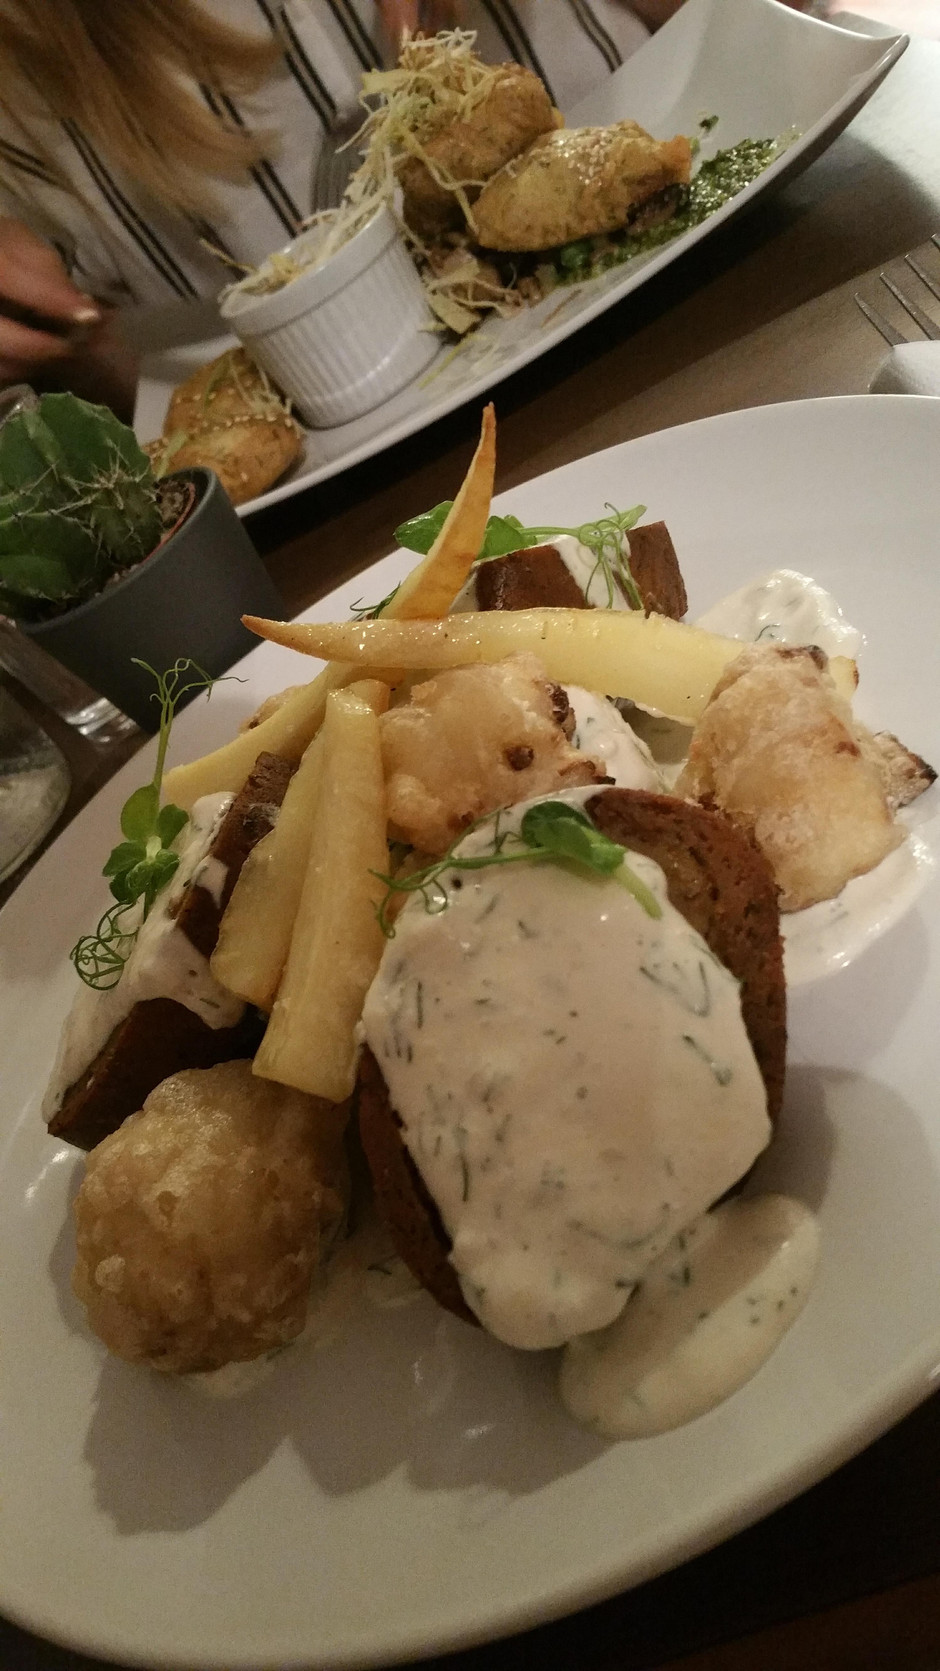 Vegan food in Dublin